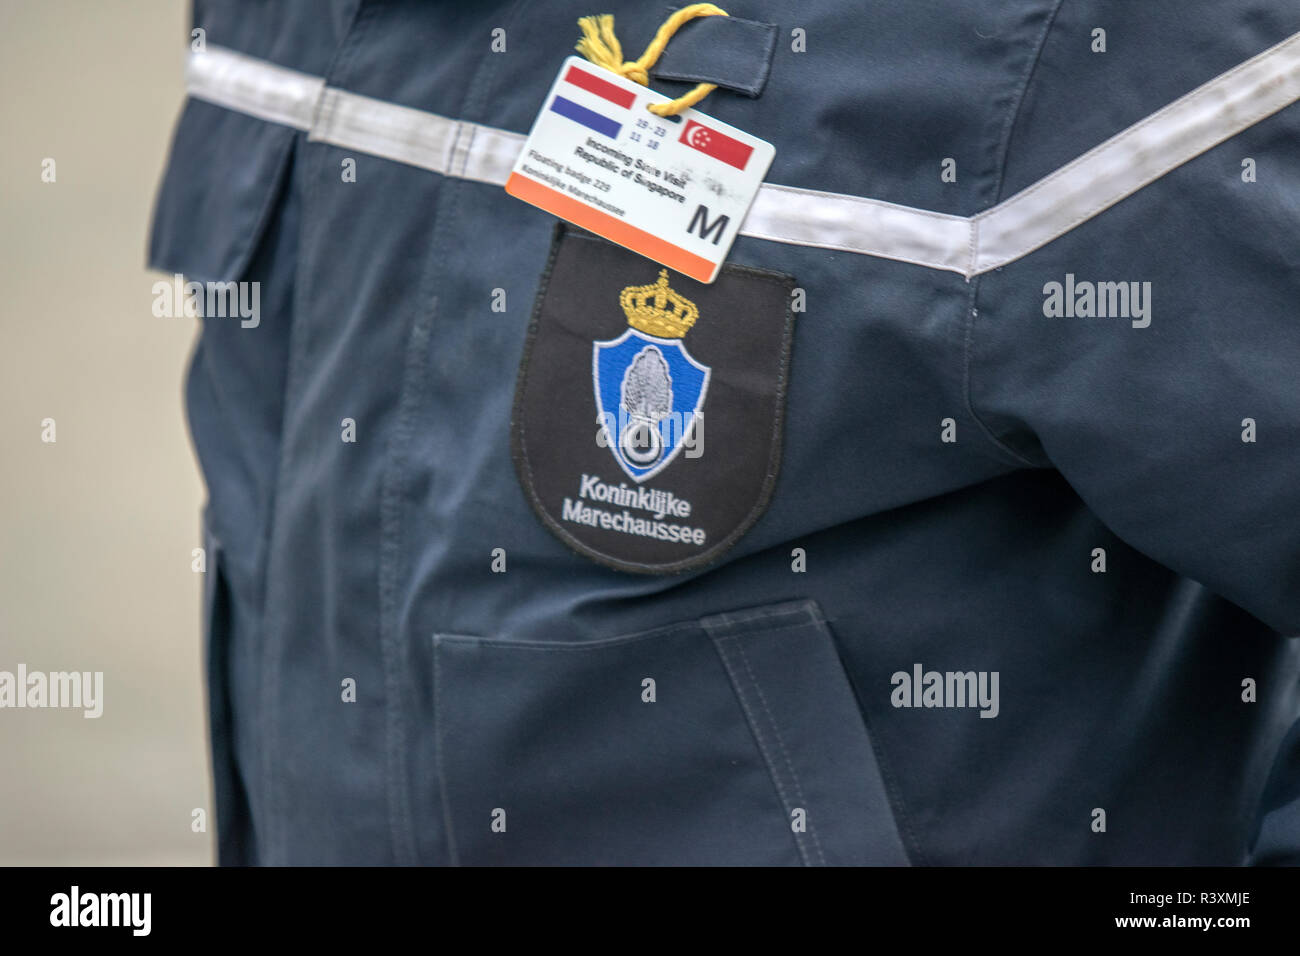 Front Side Jacket Koninklijke Marechaussee At Amsterdam The Netherlands 2018 - Stock Image